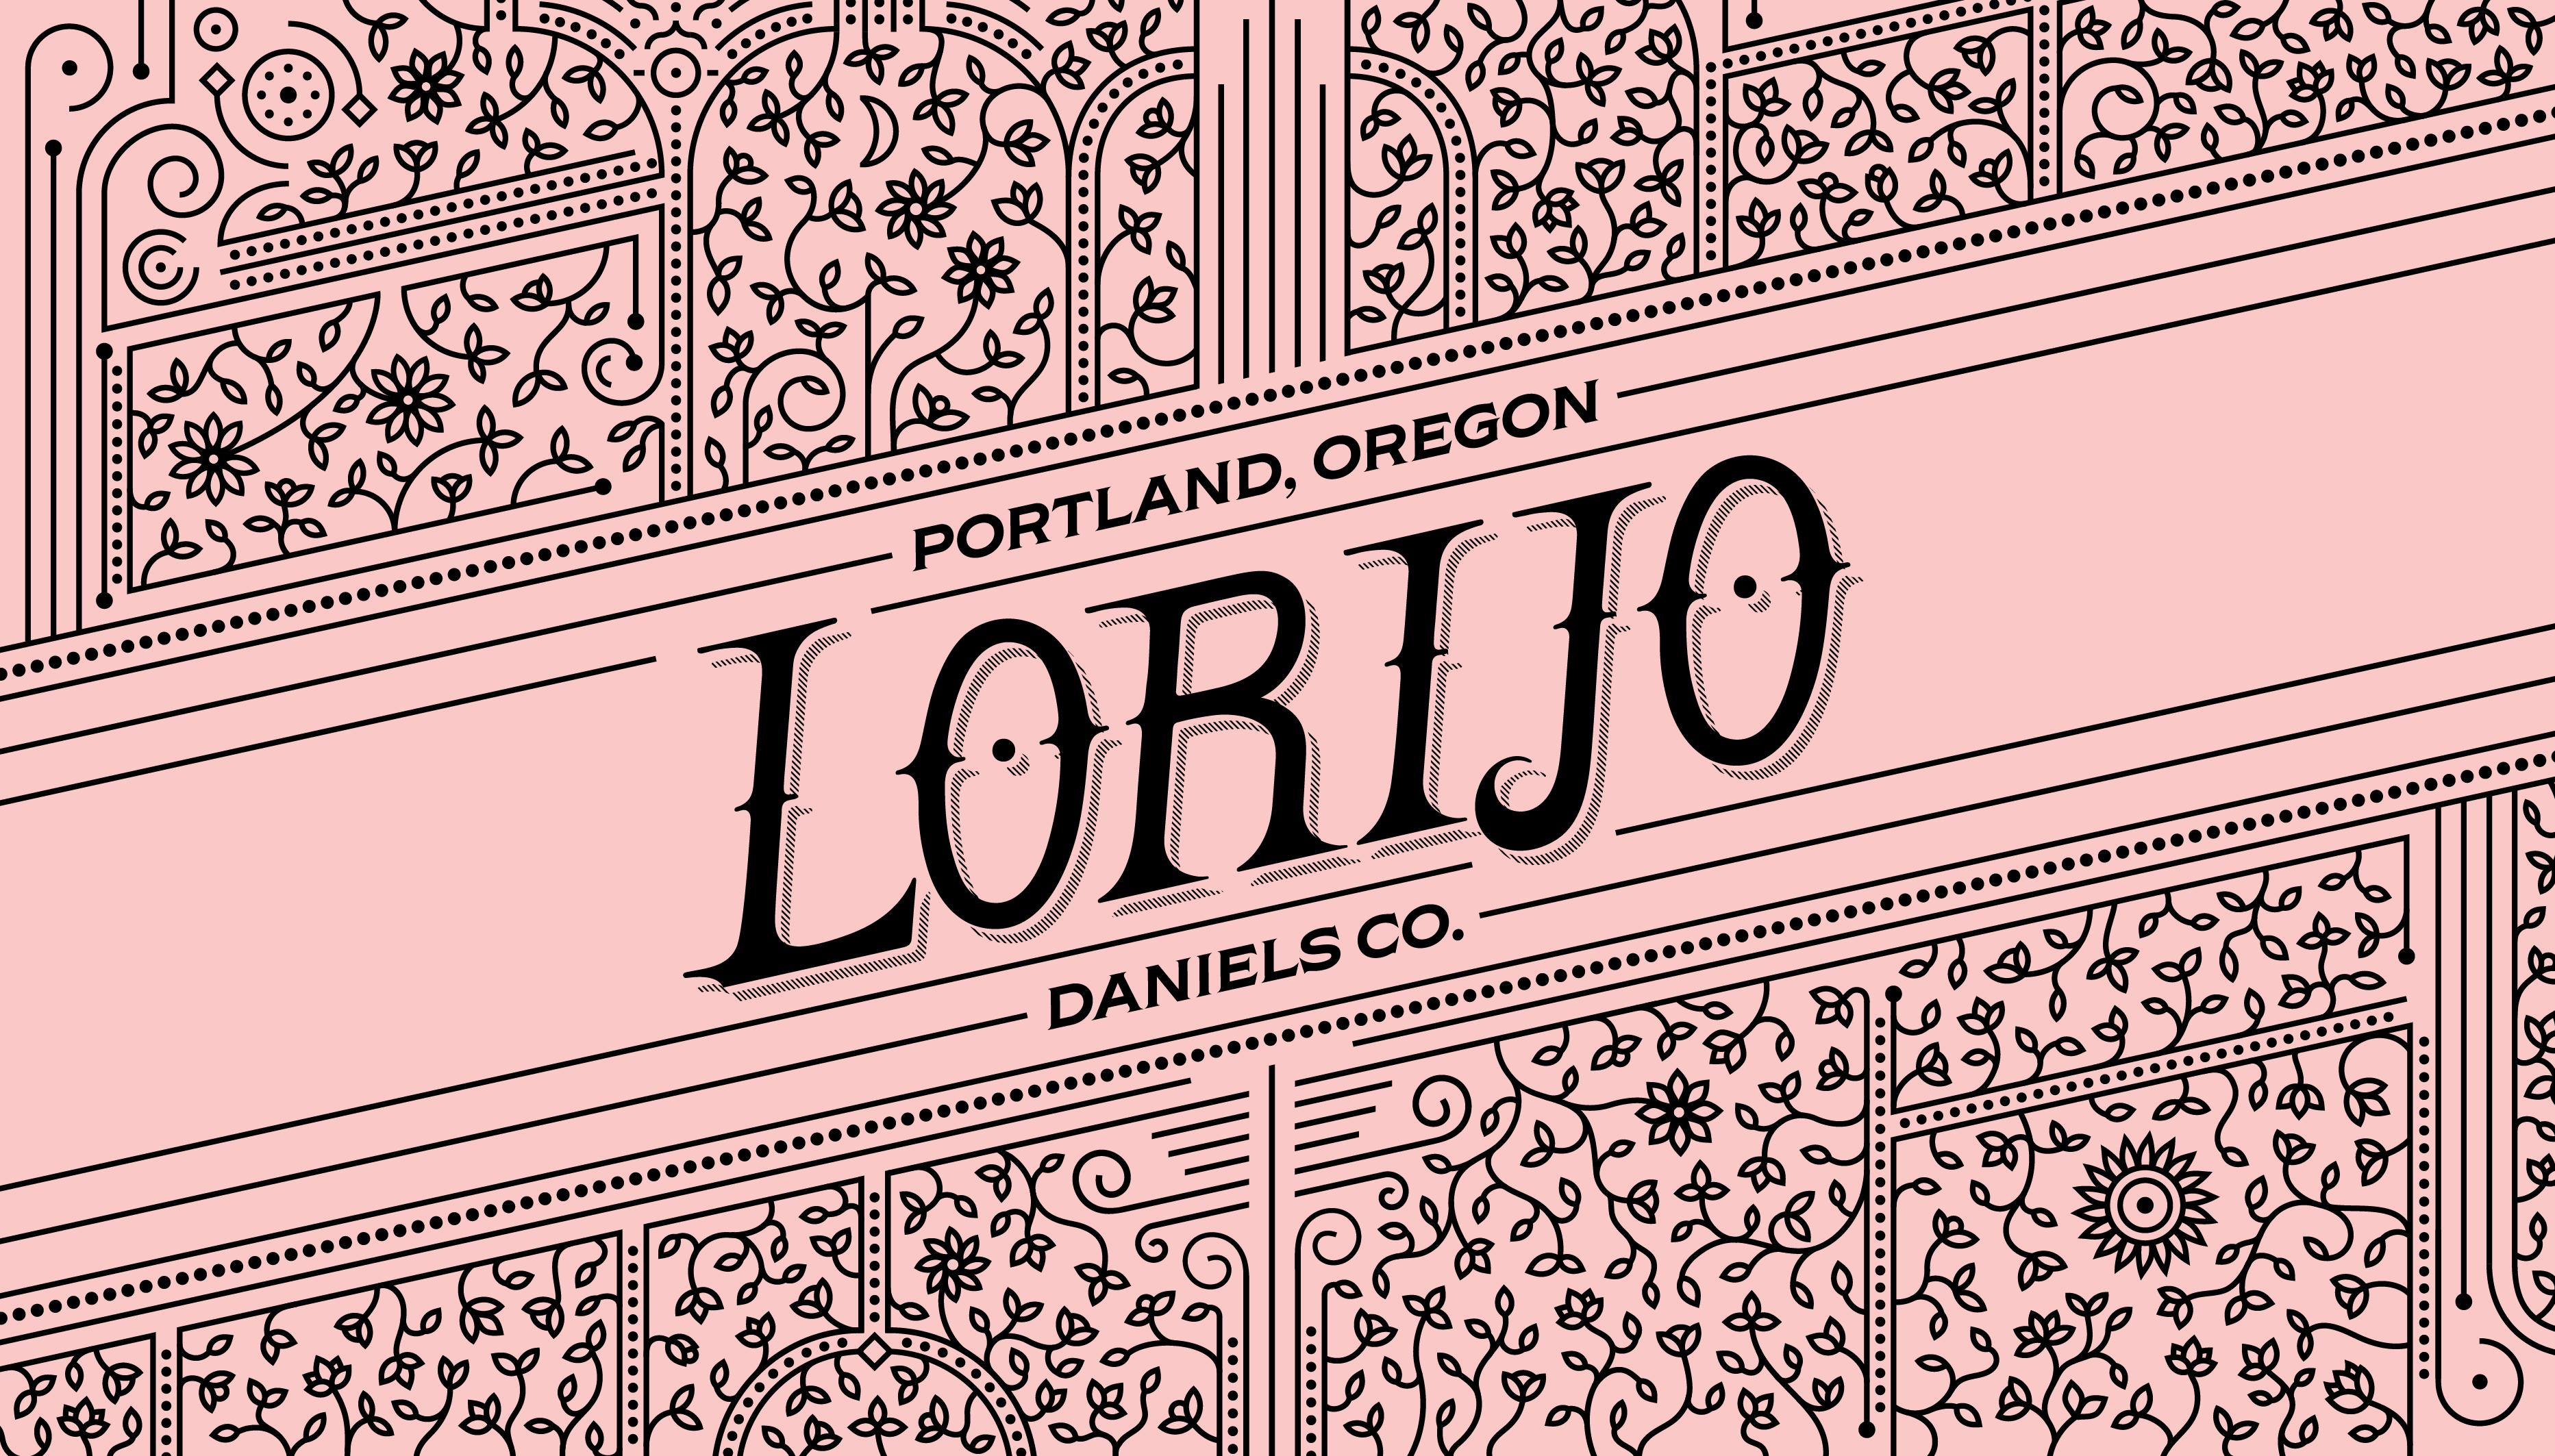 lorijo_business_card_PINK-01